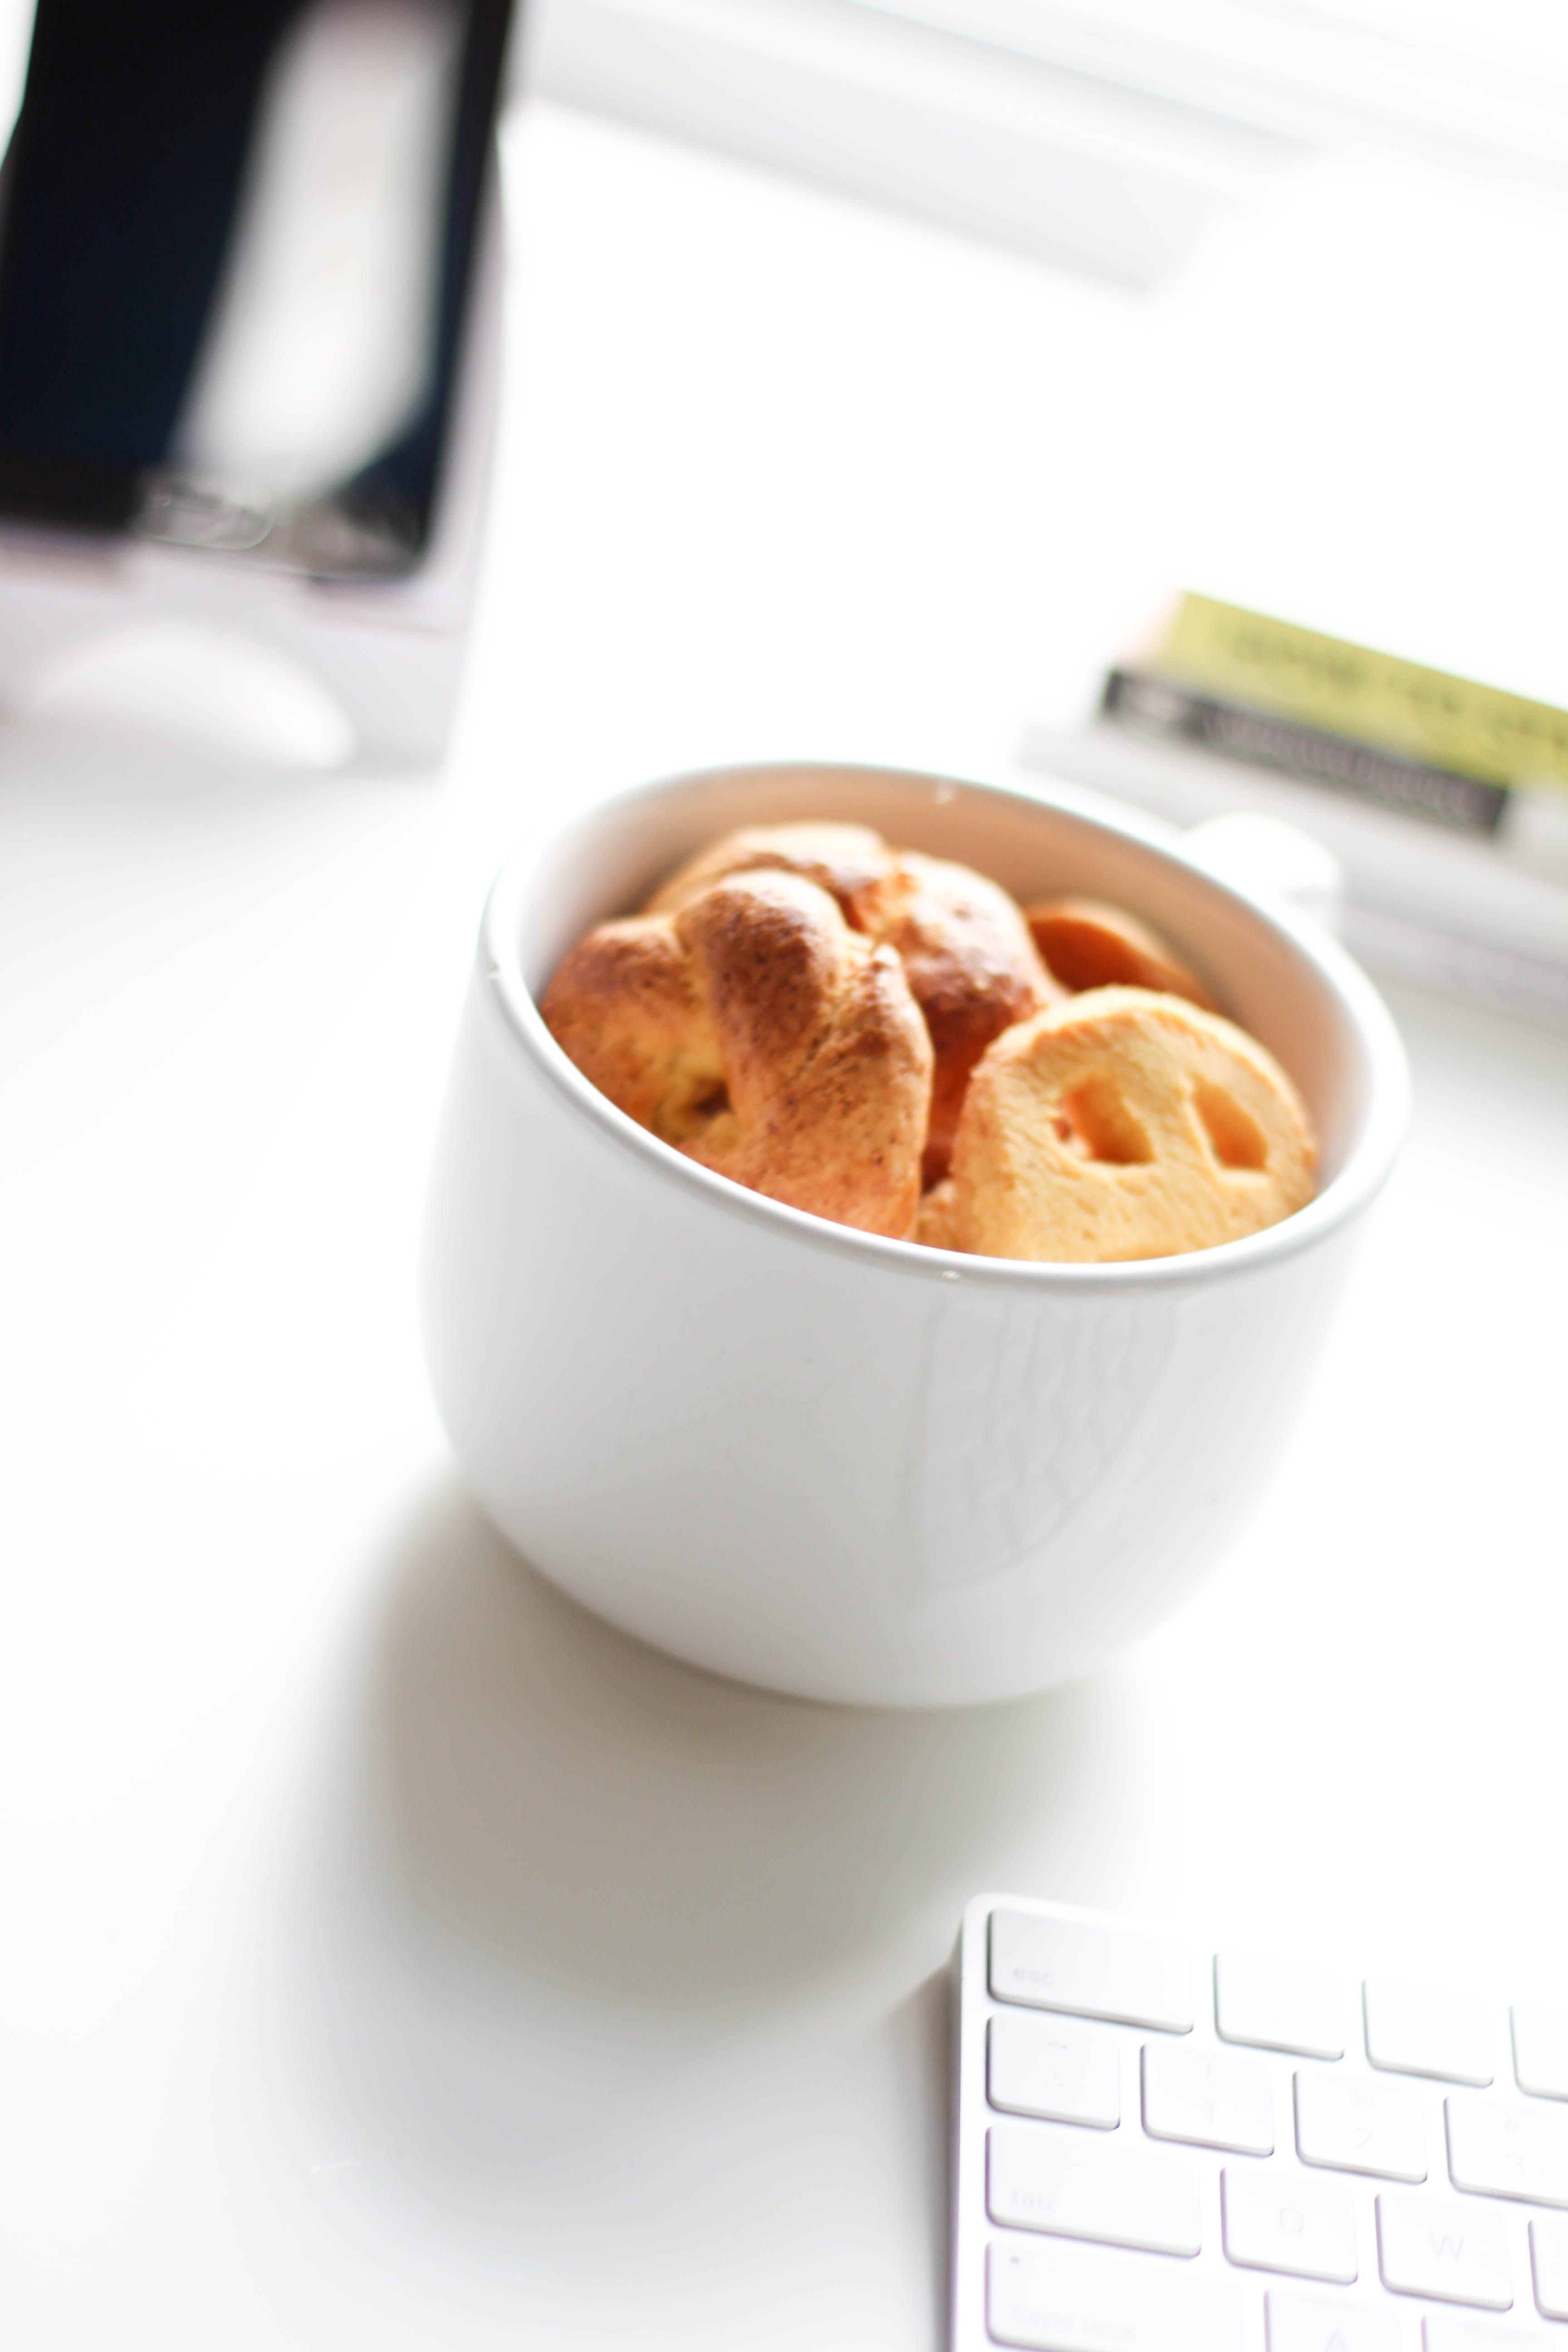 White Ceramic Mug With Cookies